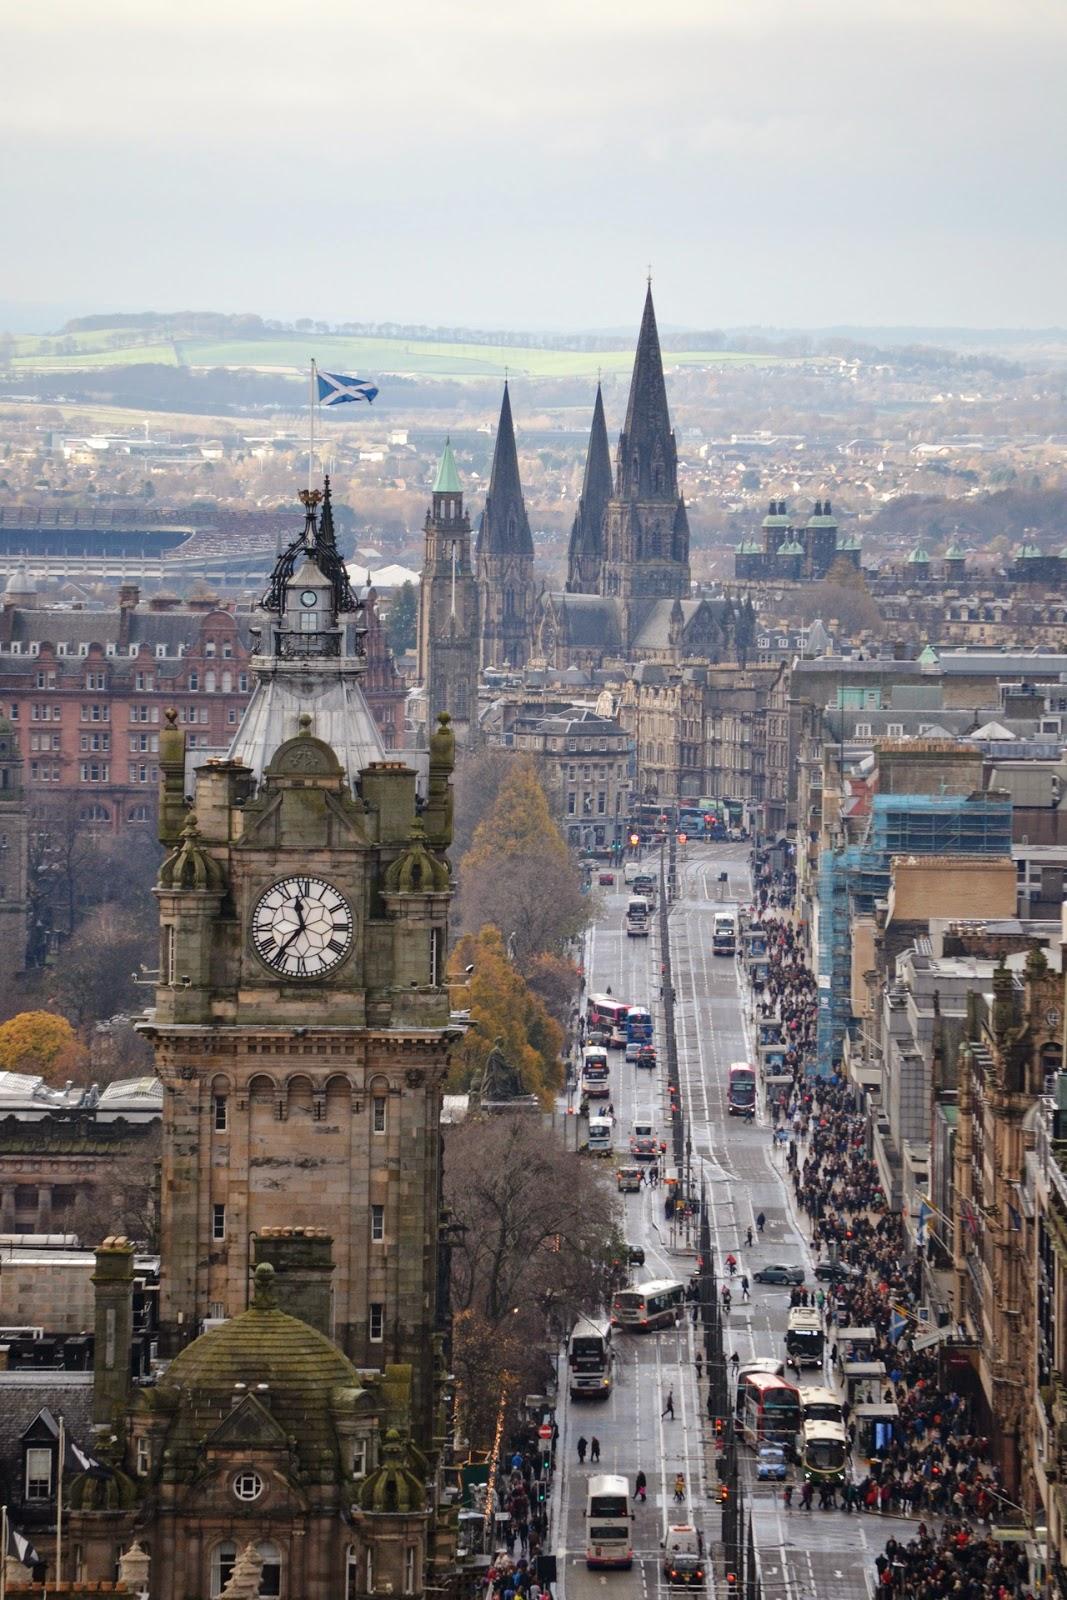 Escocia una tierra de leyenda y misterio edimburgo for Mas edimburgo